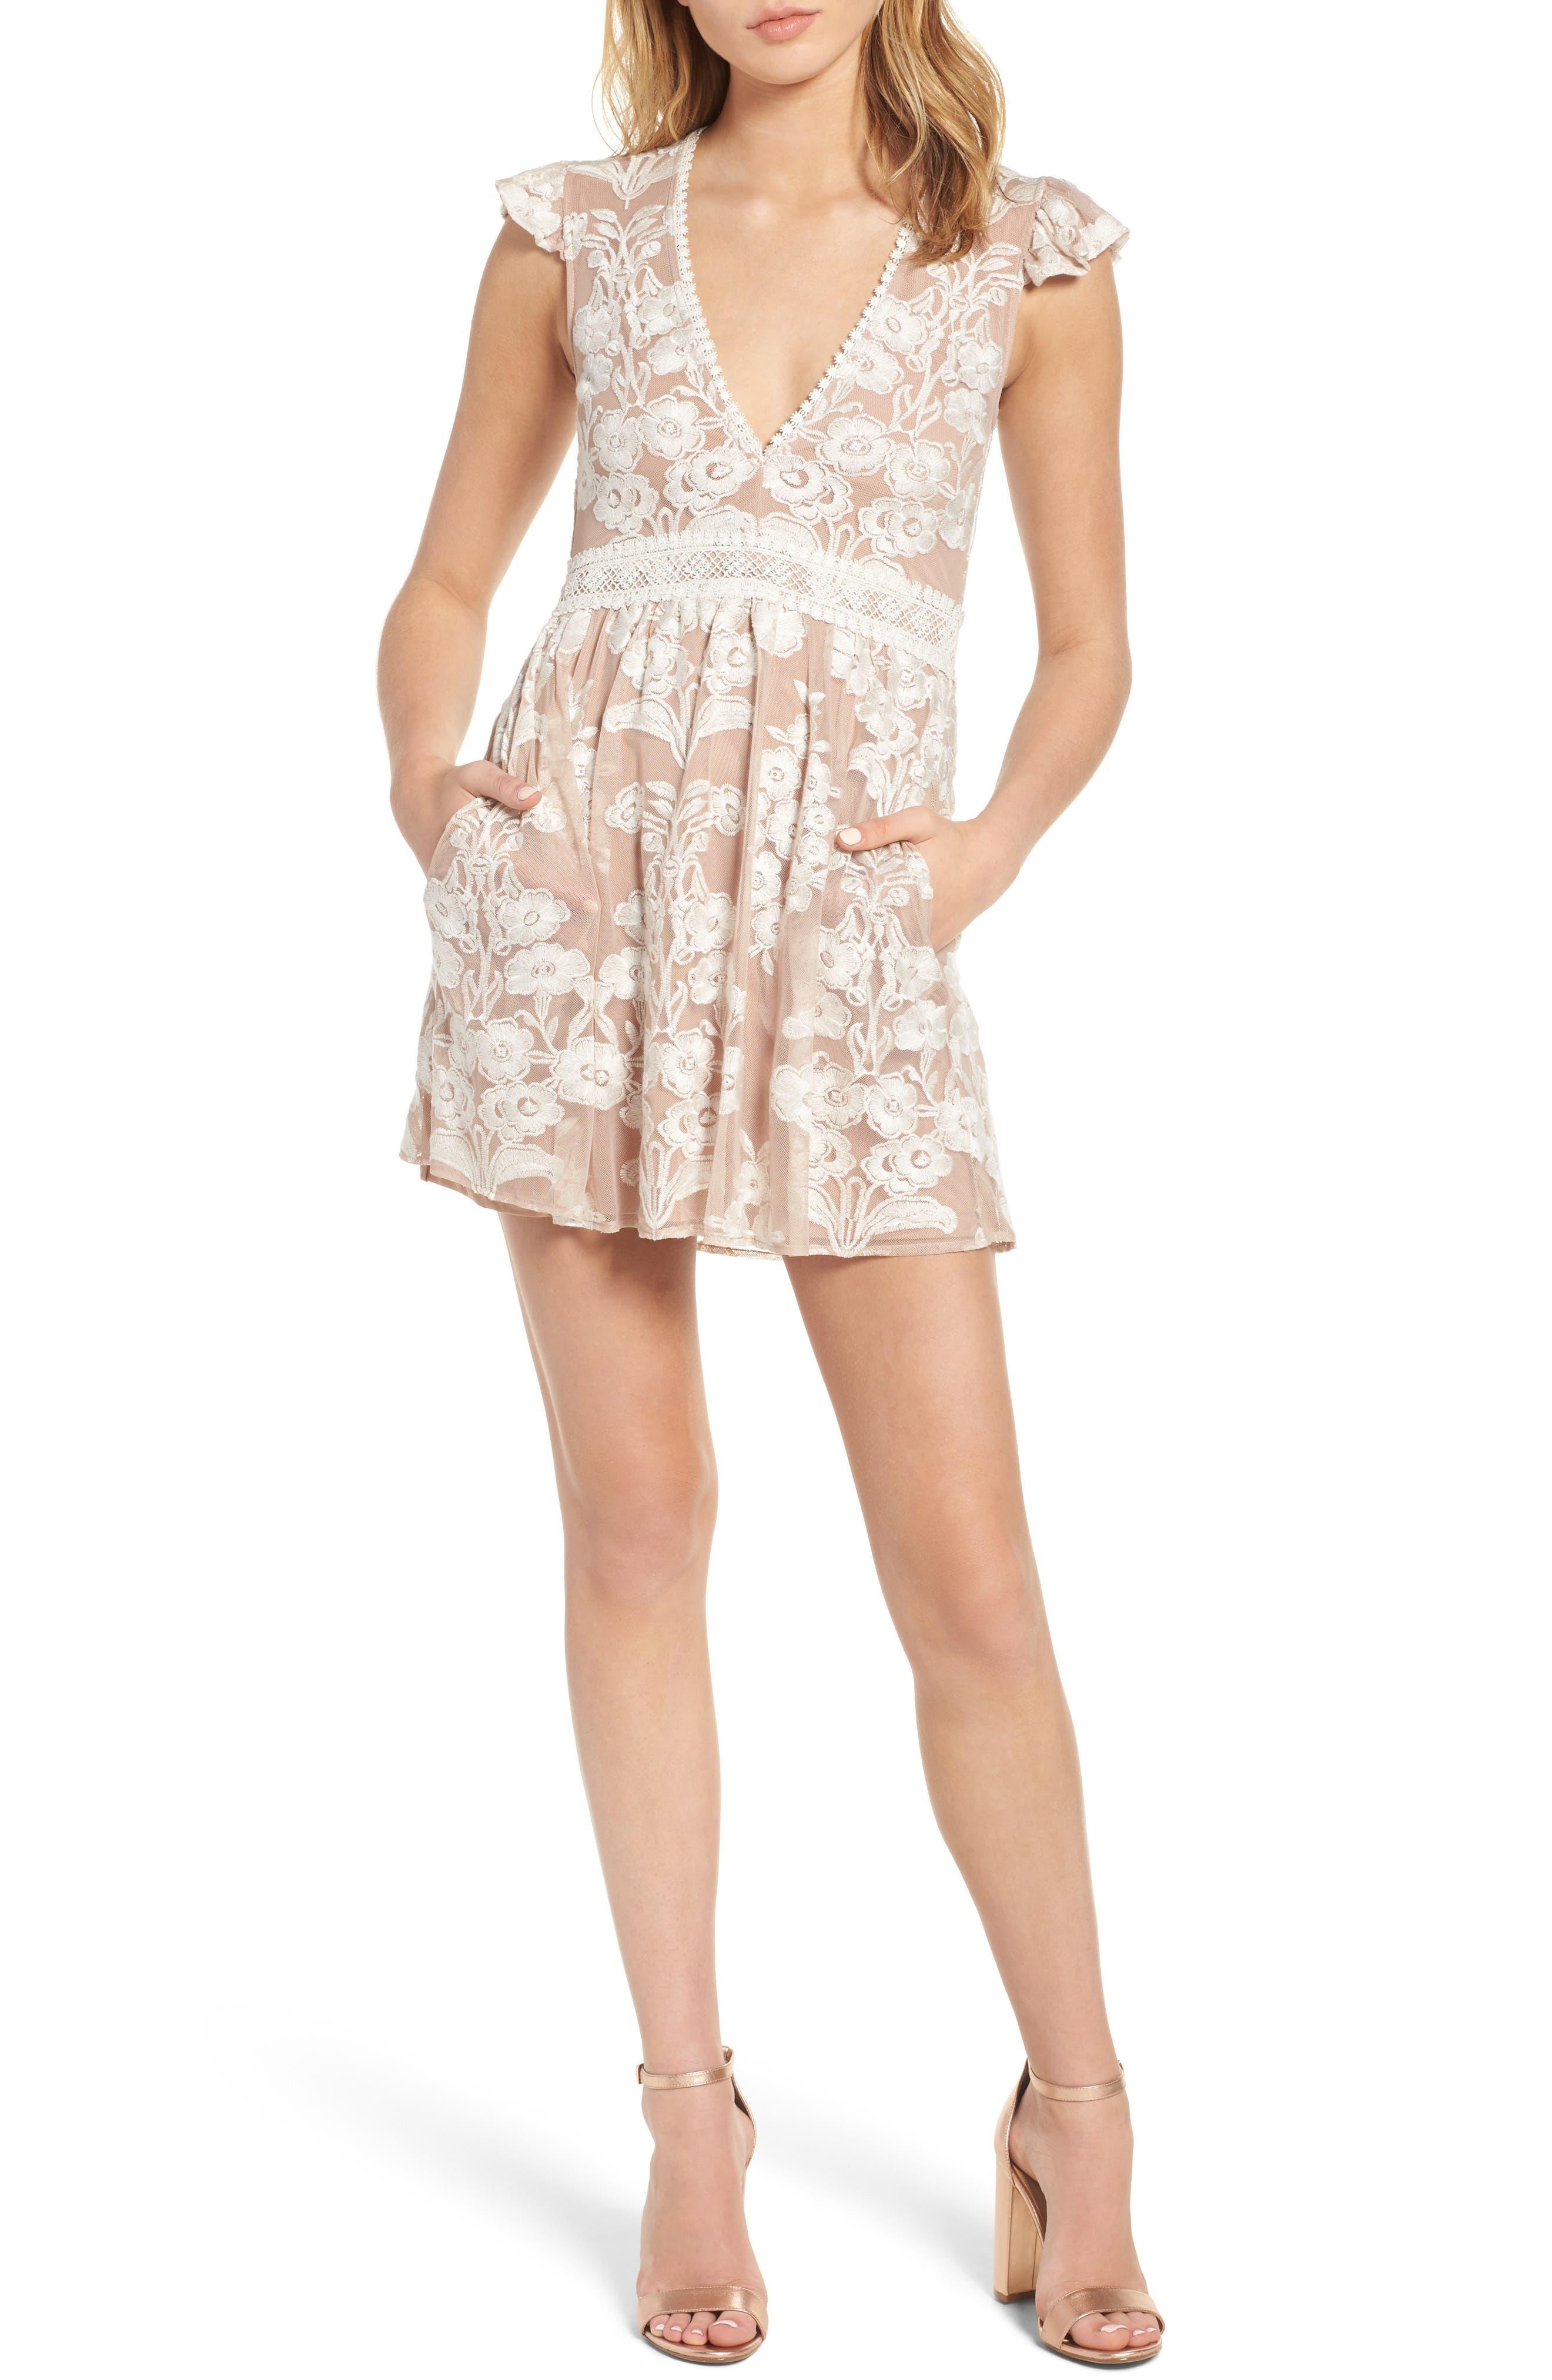 FOR LOVE & LEMONS Temecula Illusion Lace Minidress, Main, color, 902